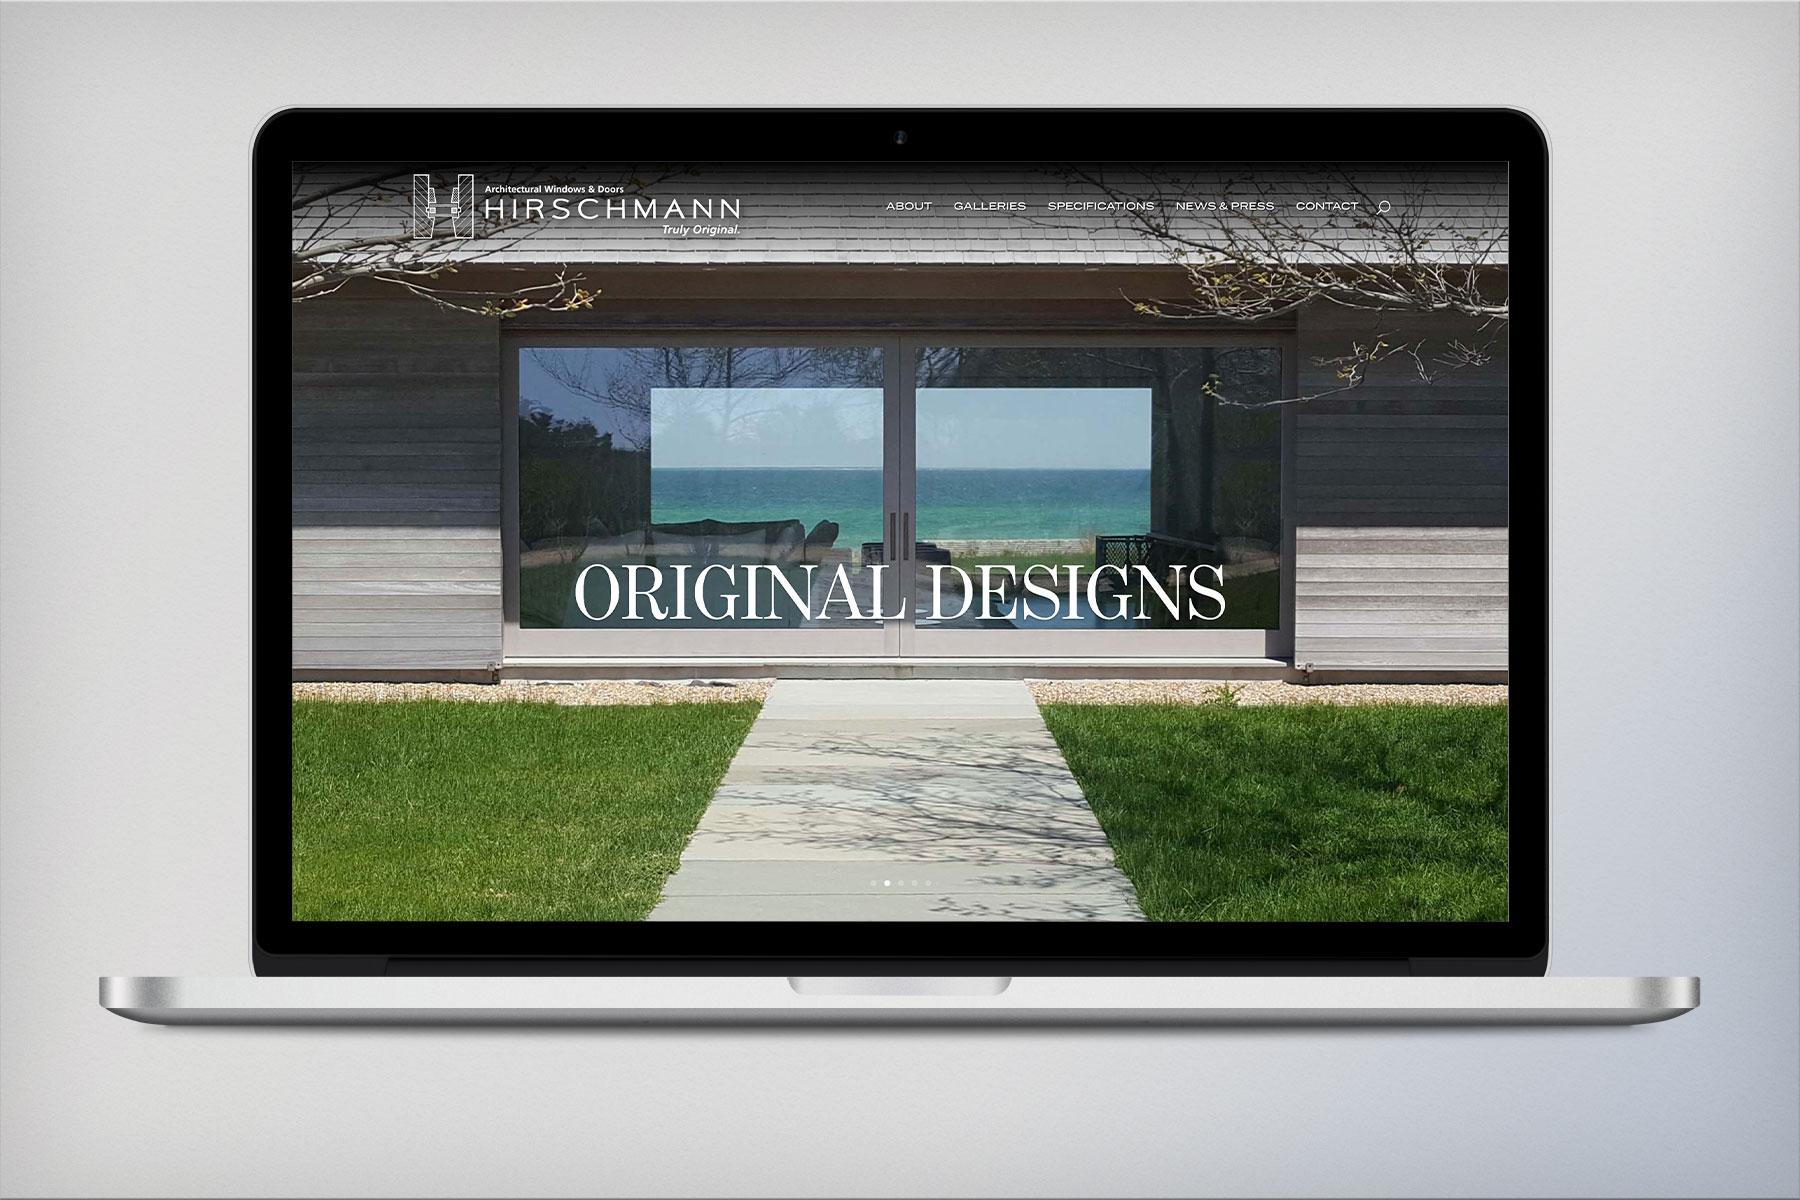 H. Hirschmann LTD - Architectural Wood Windows and Doors - website design and development